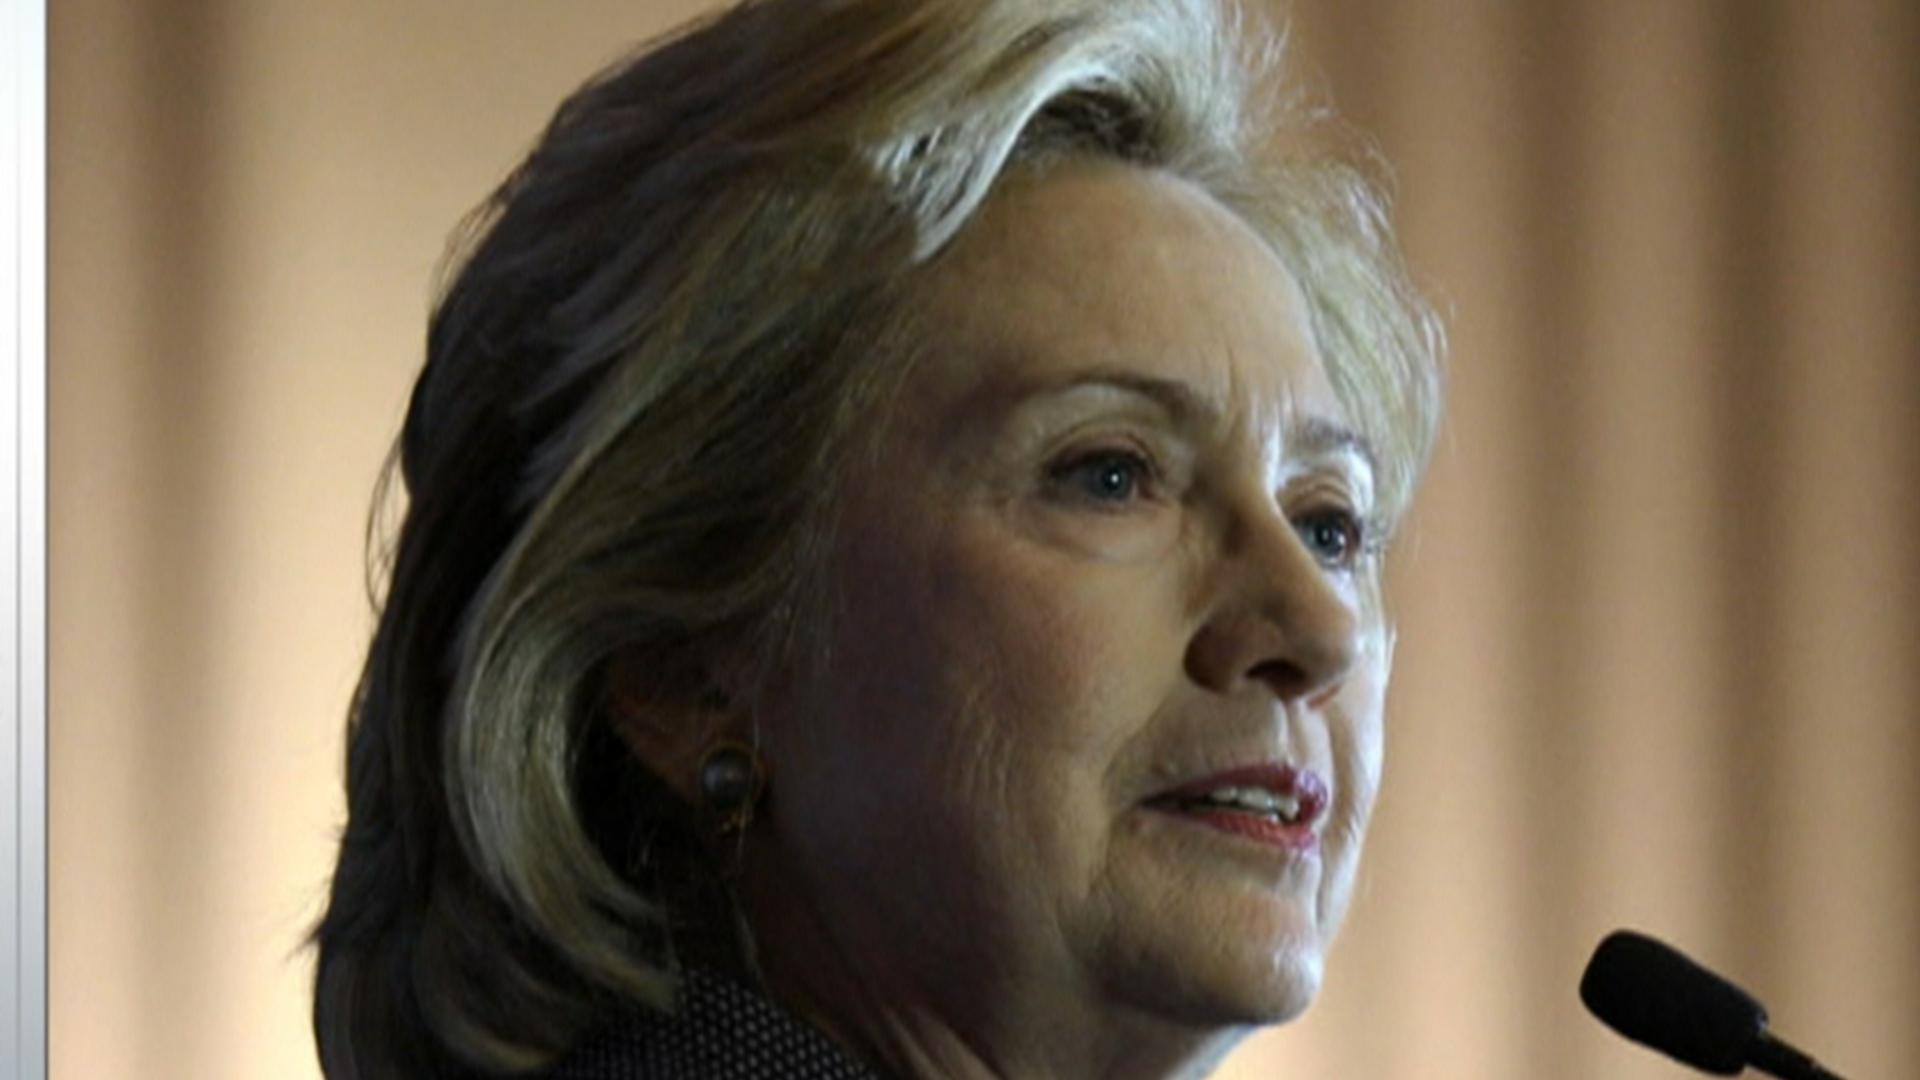 Joy Reid: Focus on Hillary, not her husband